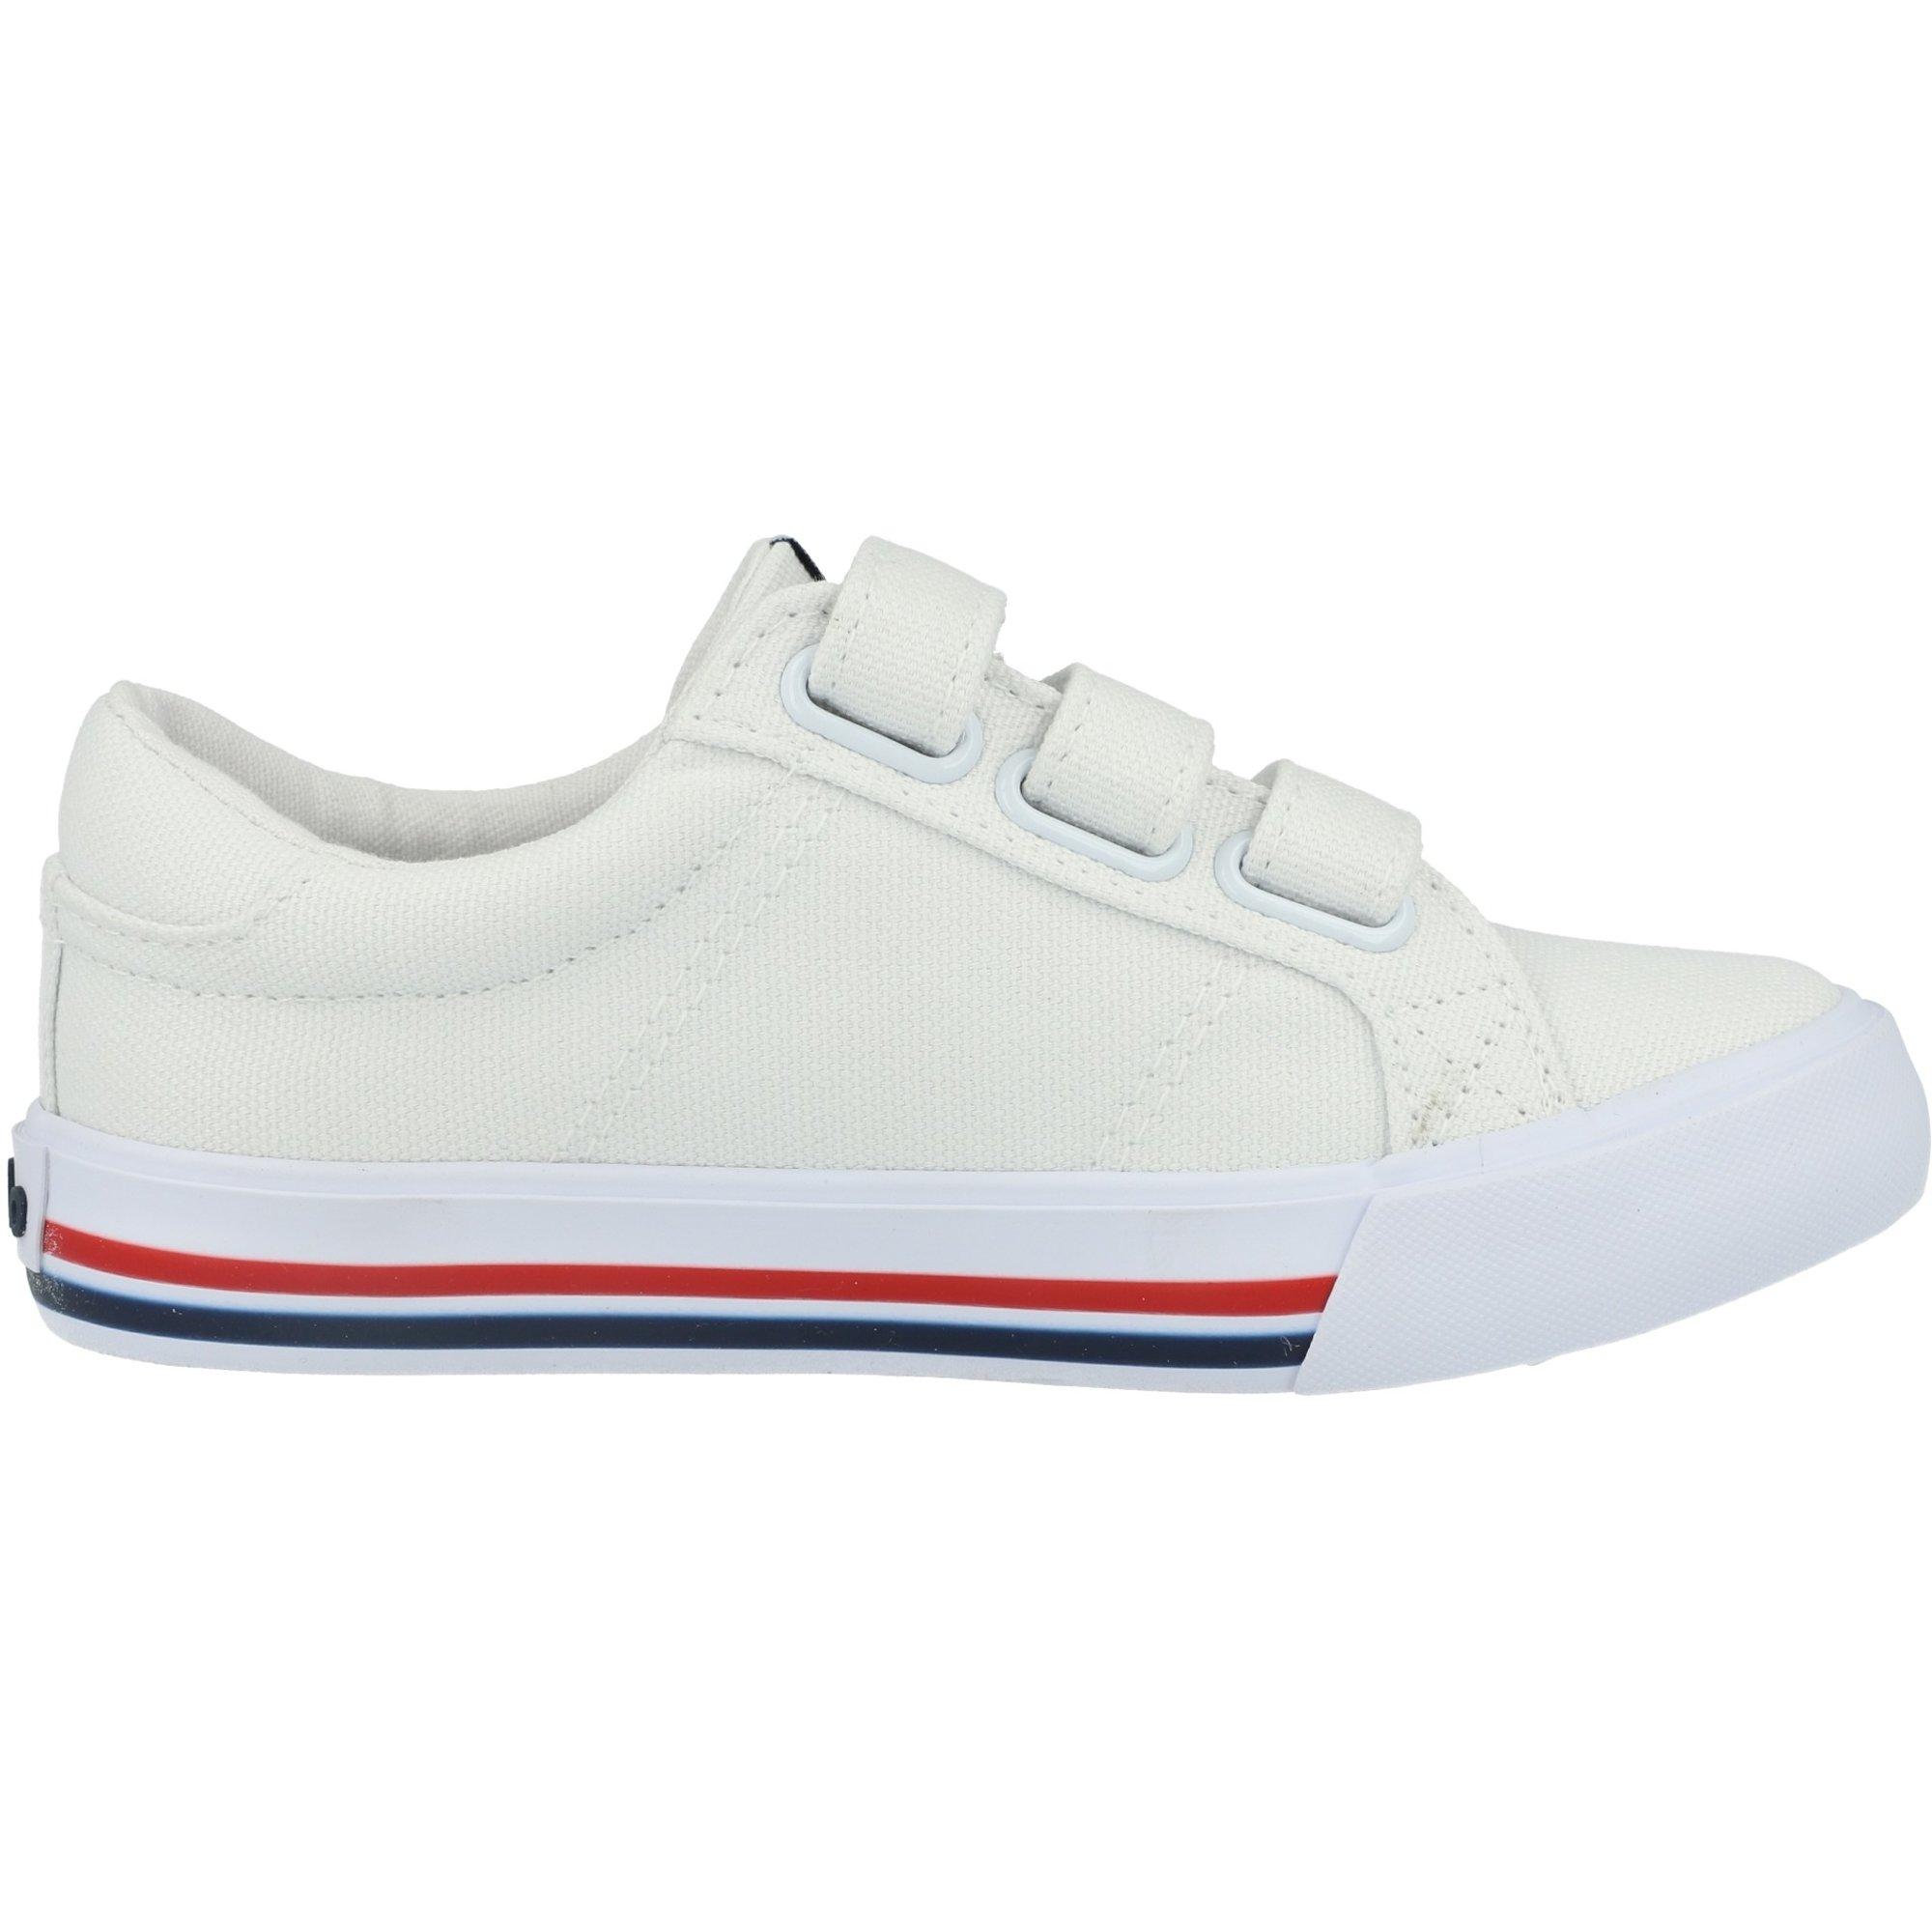 Polo Ralph Lauren Evanston EZ C White/Navy Canvas